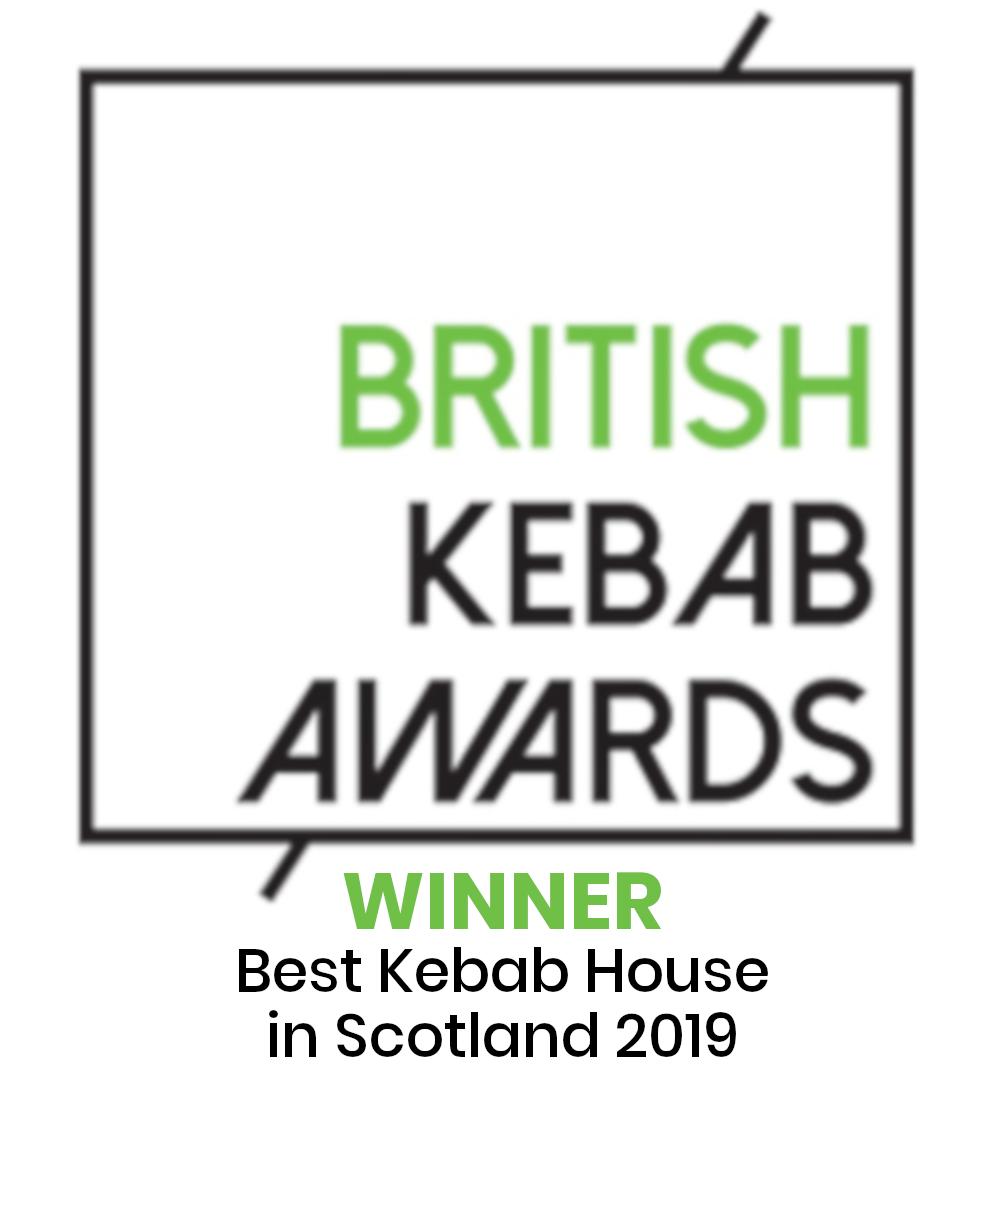 British Kebab Awards 2019 Winner -